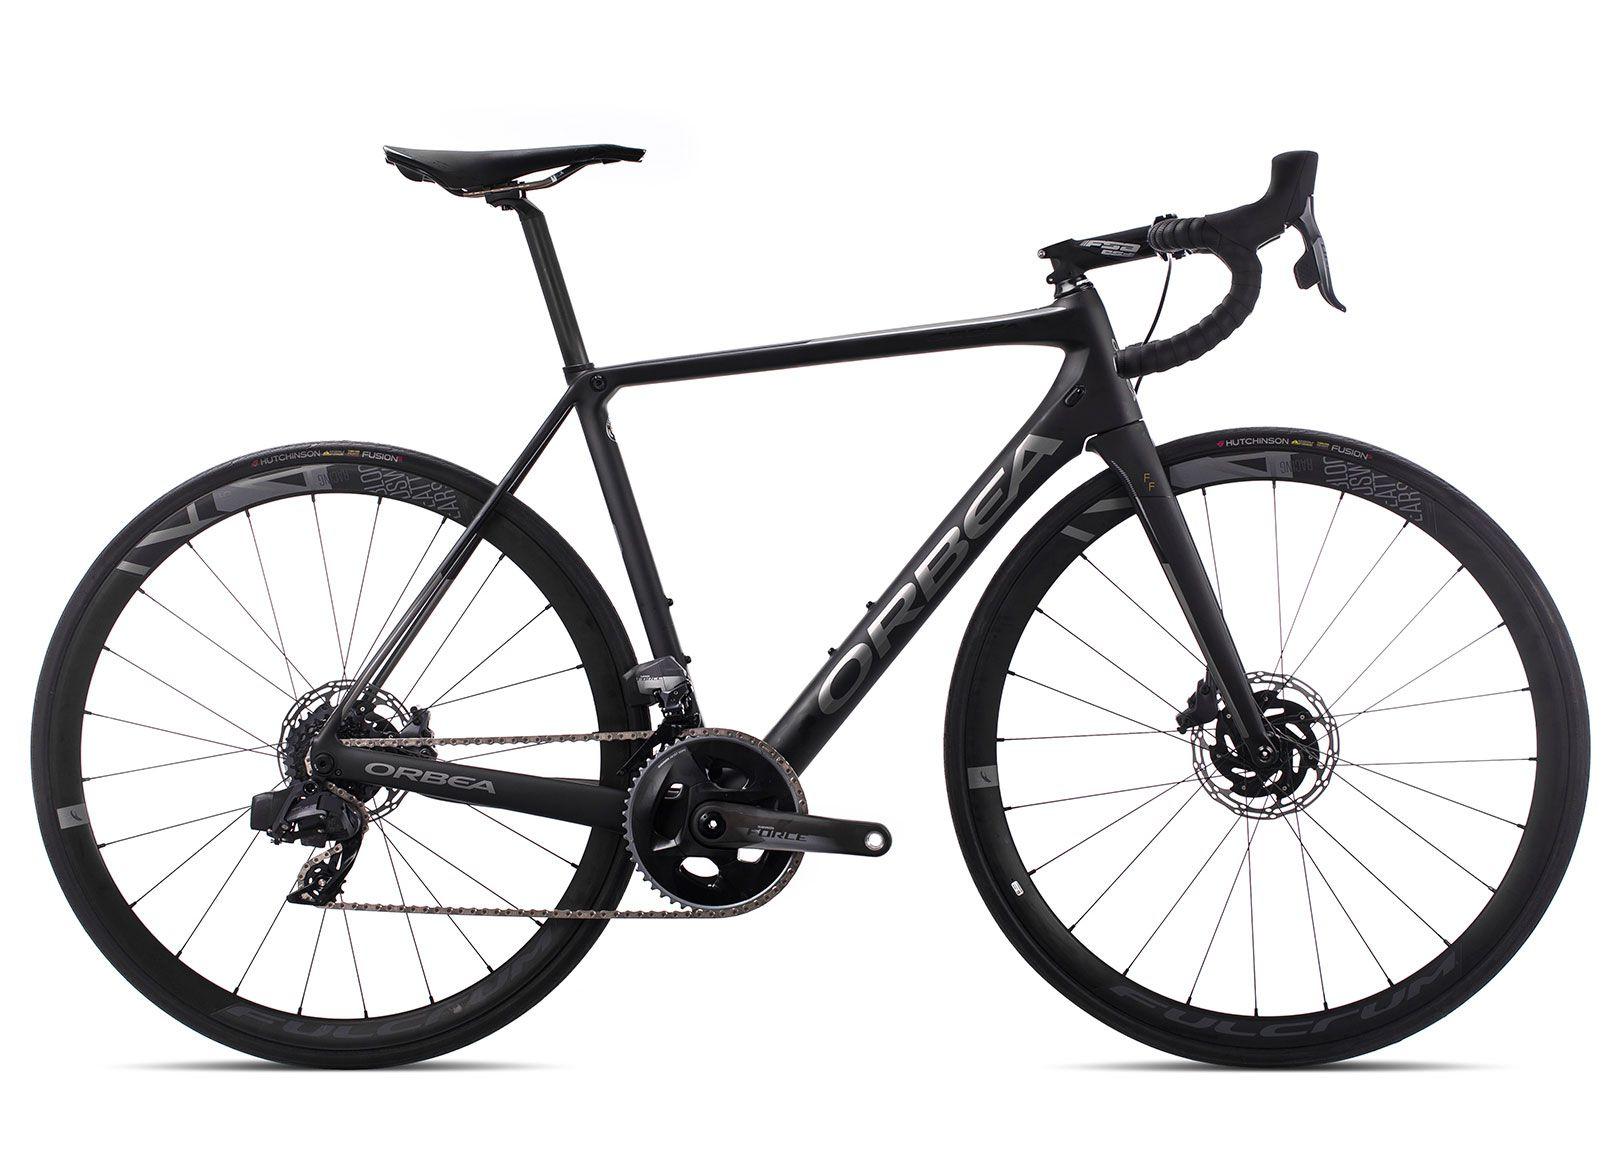 Bicicleta estrada Orbea Orca M21i TEAM-D Tam 53, Preta - 2020